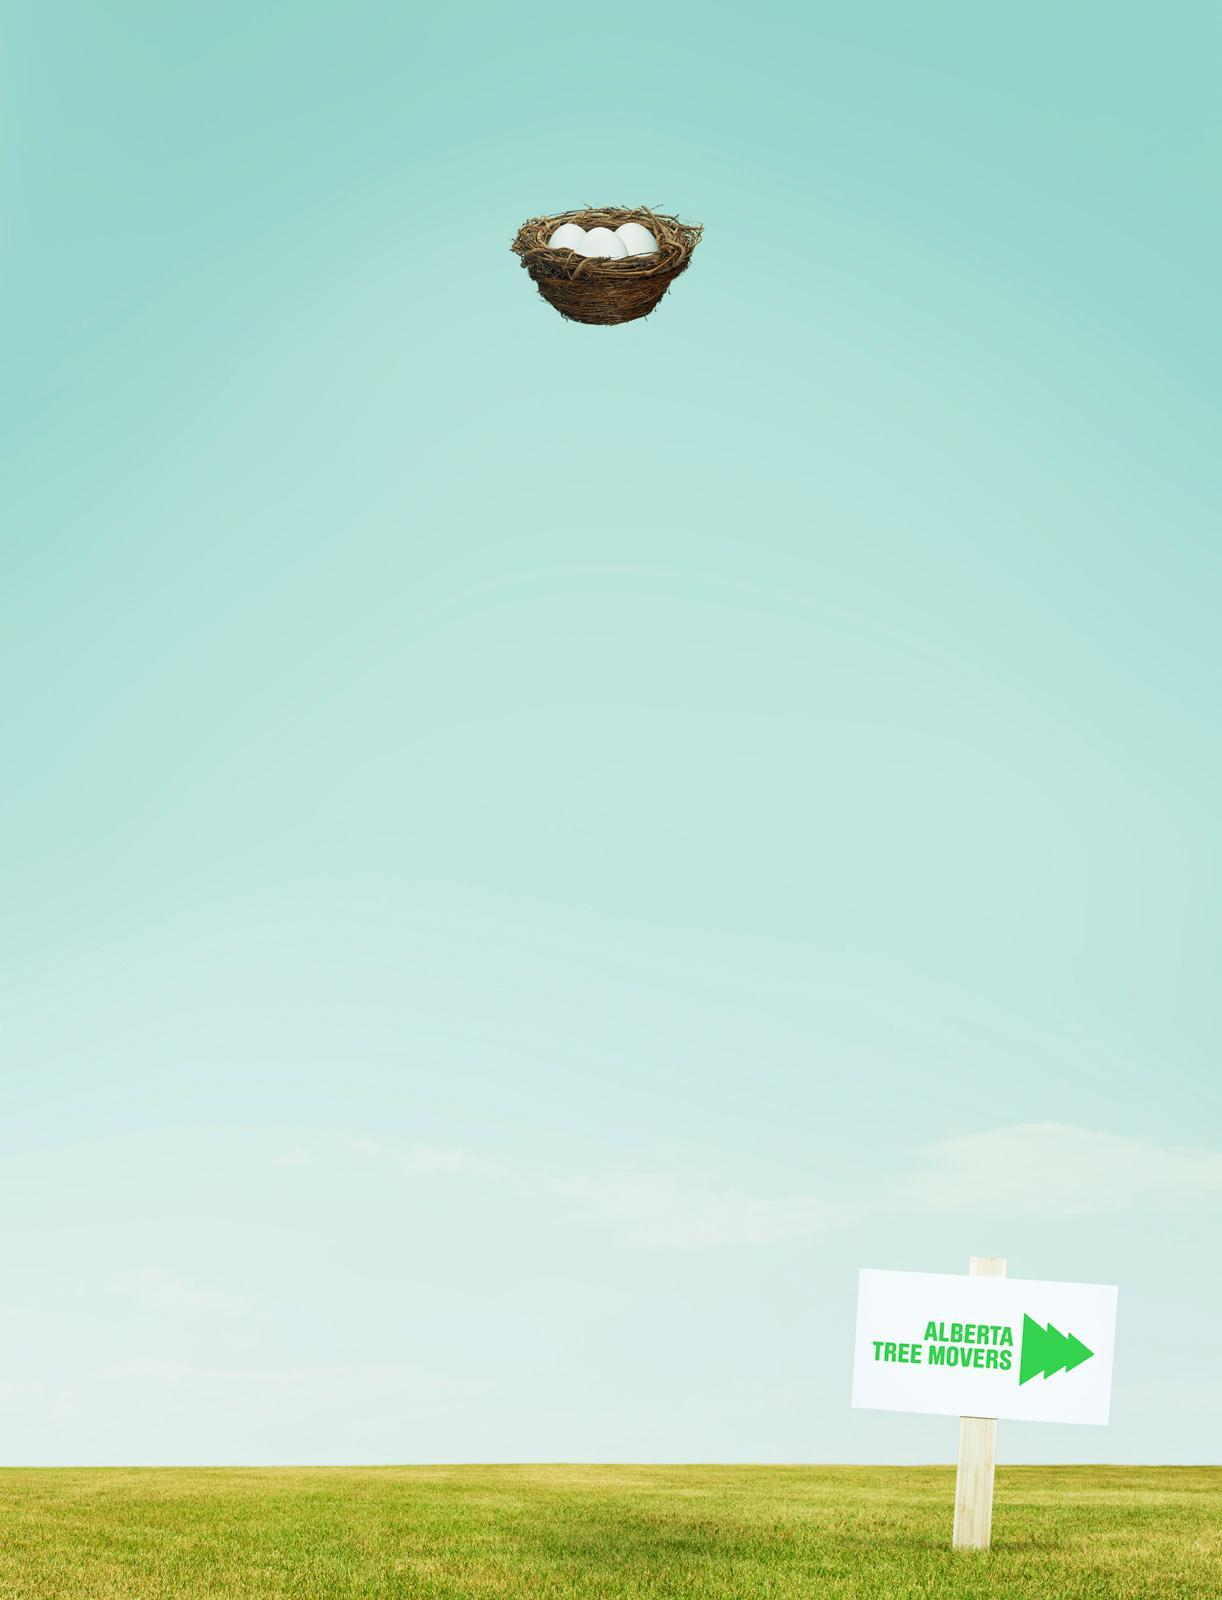 Alberta Tree Movers Print Ad -  Nest